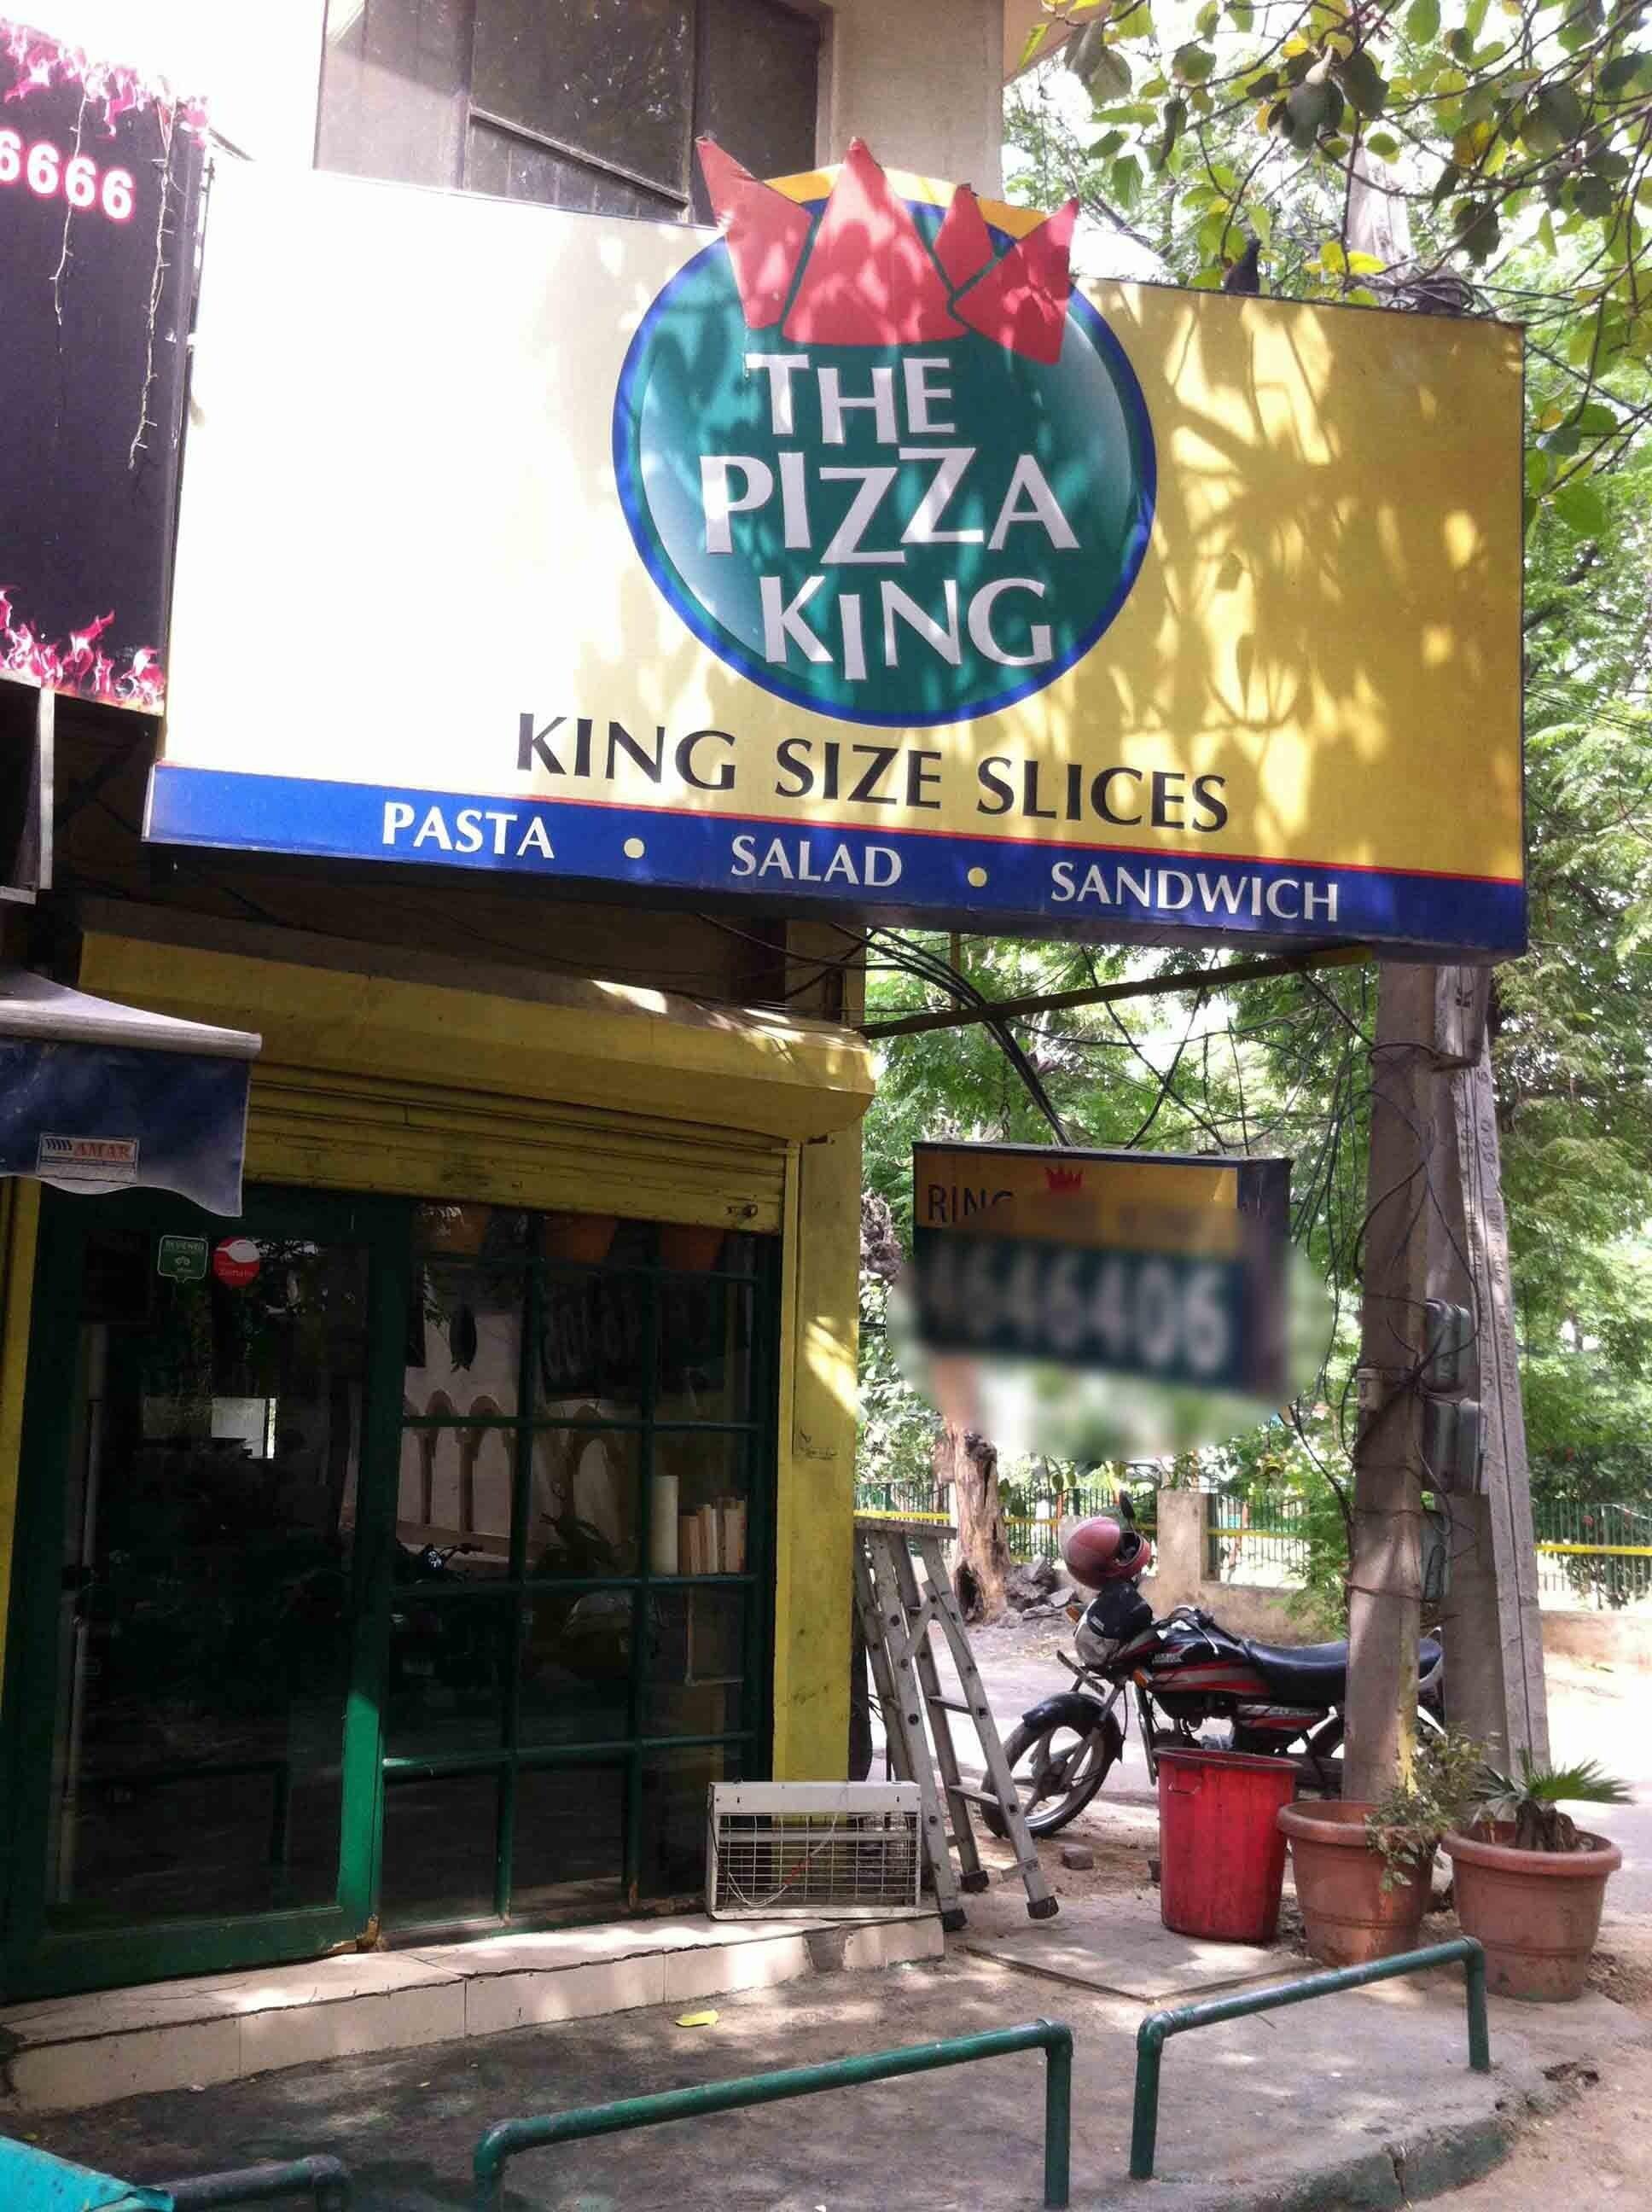 Pizza King SM - Sarabha Nagar - Ludhiana Image